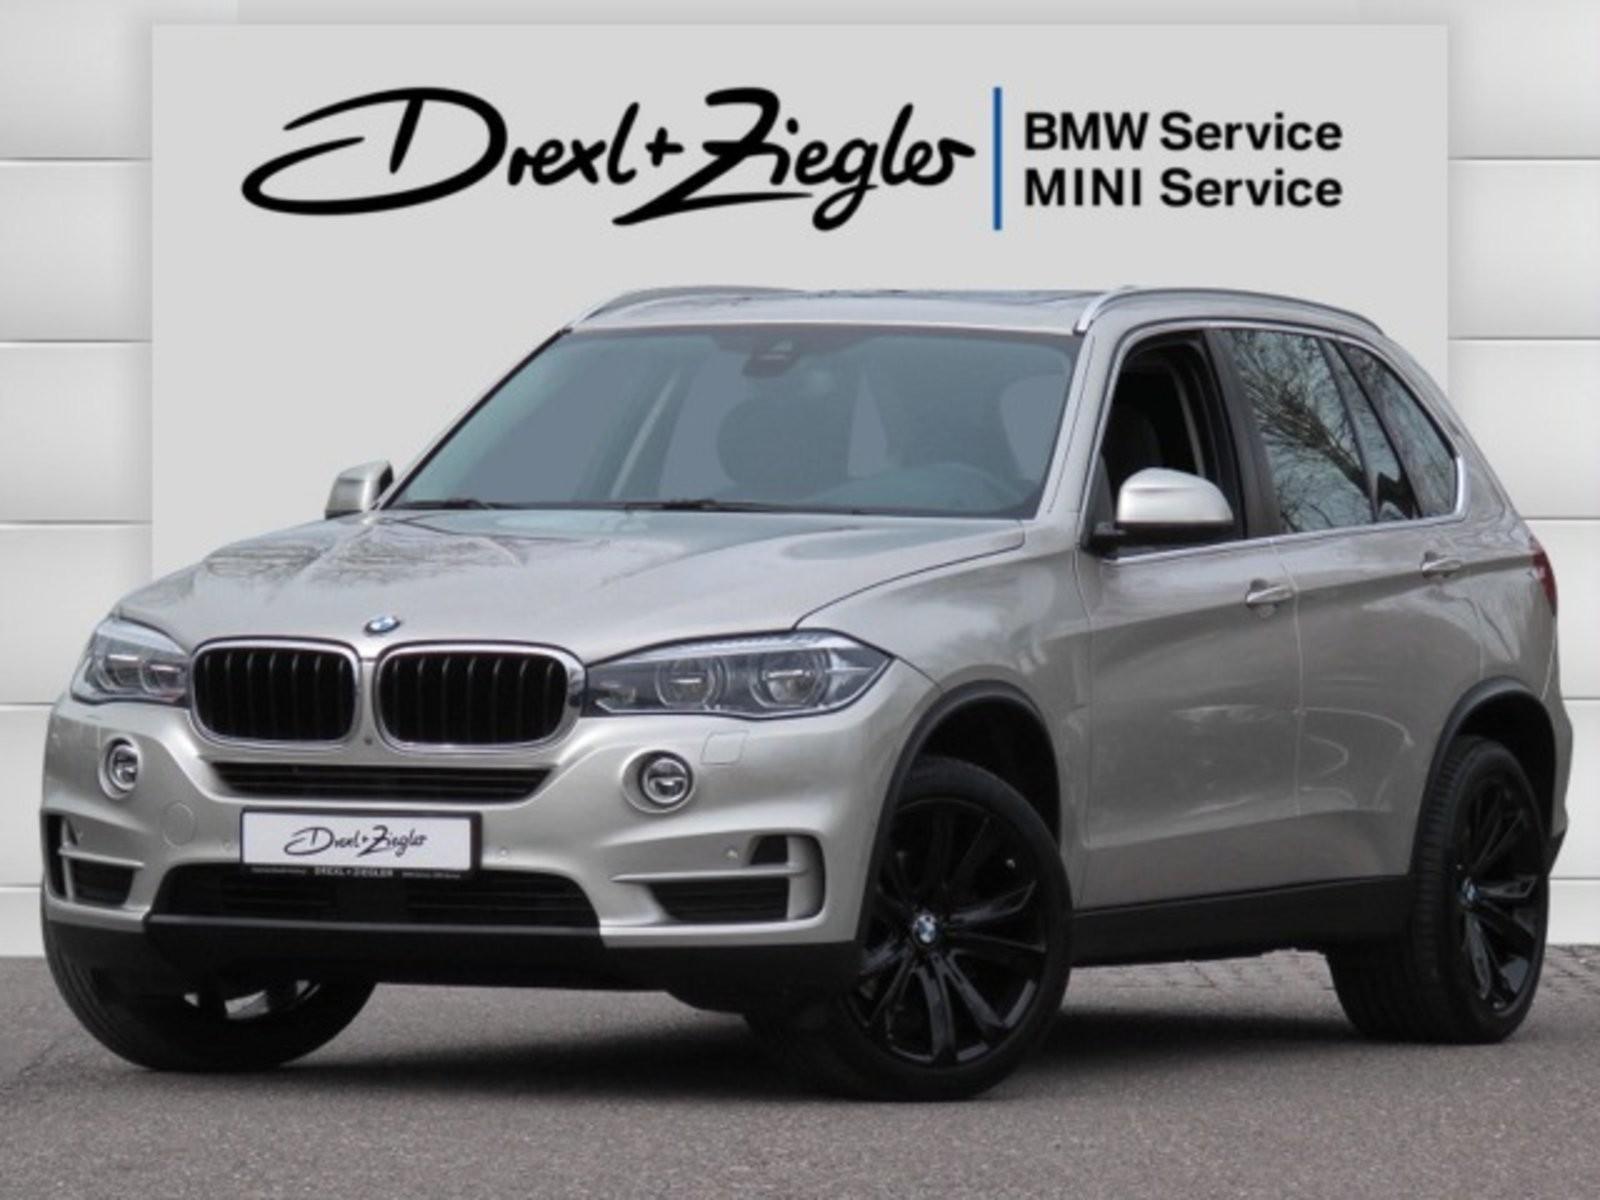 BMW X5 xDrive30d Sthzg LED ACC Panorama Kamera Alu20, Jahr 2016, Diesel